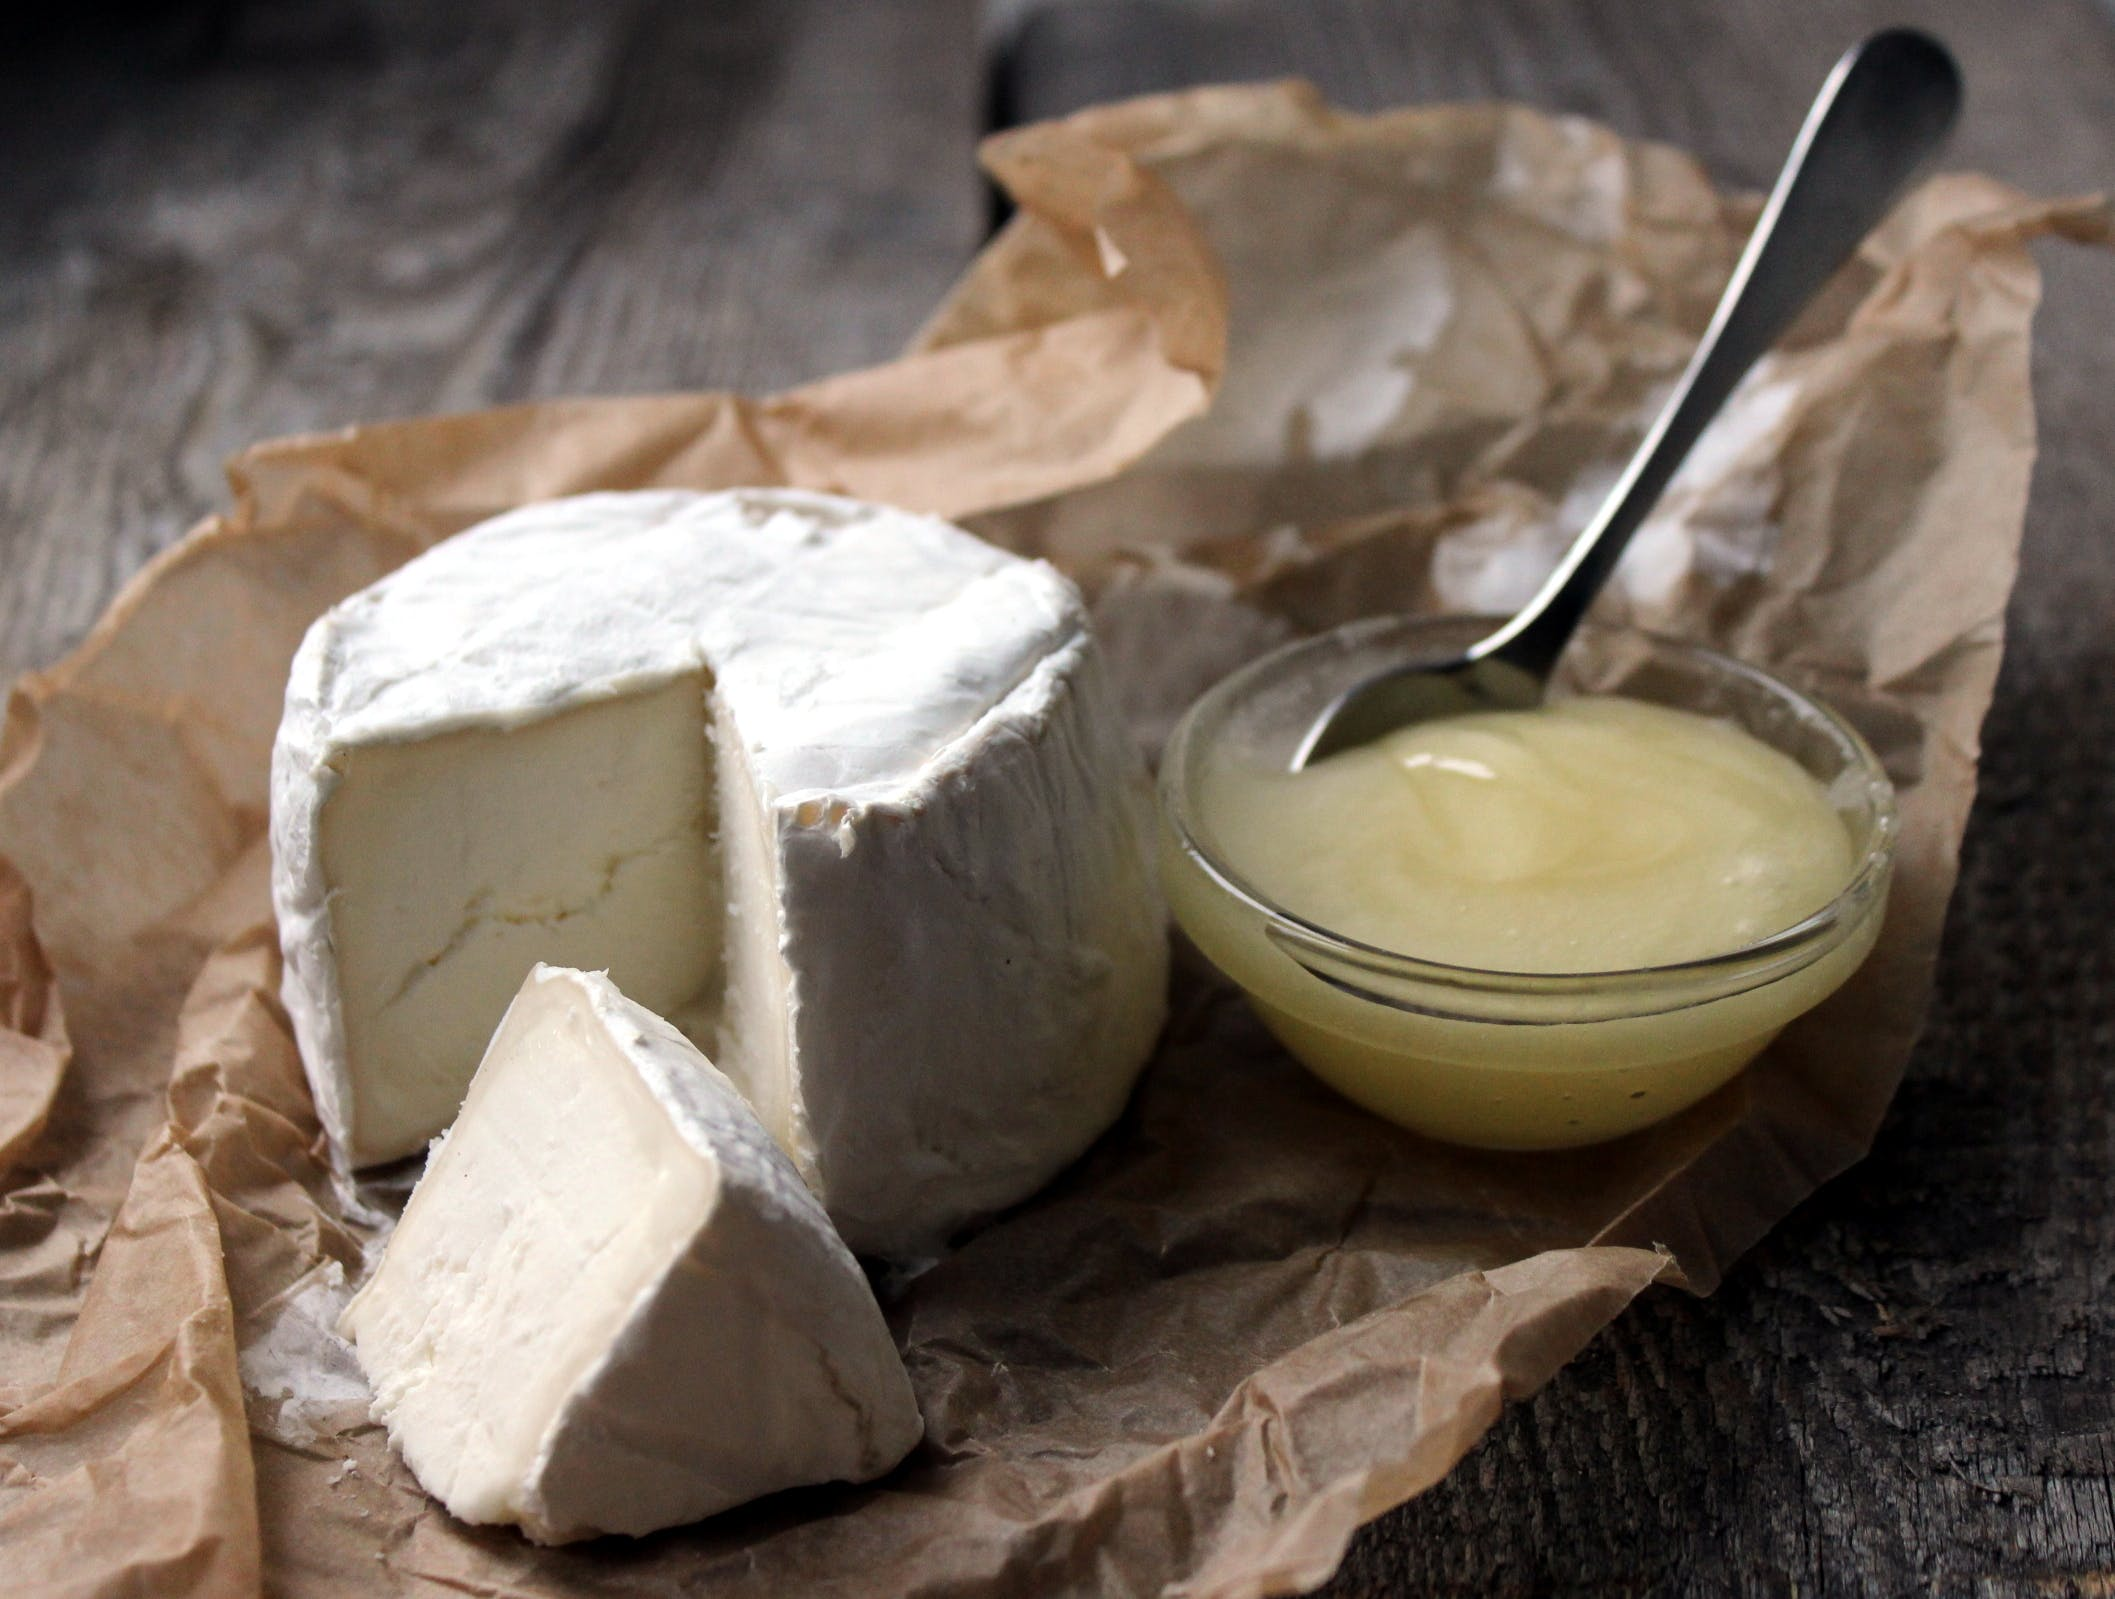 Kostenloses Stock Foto zu brett, brot, butter, essen